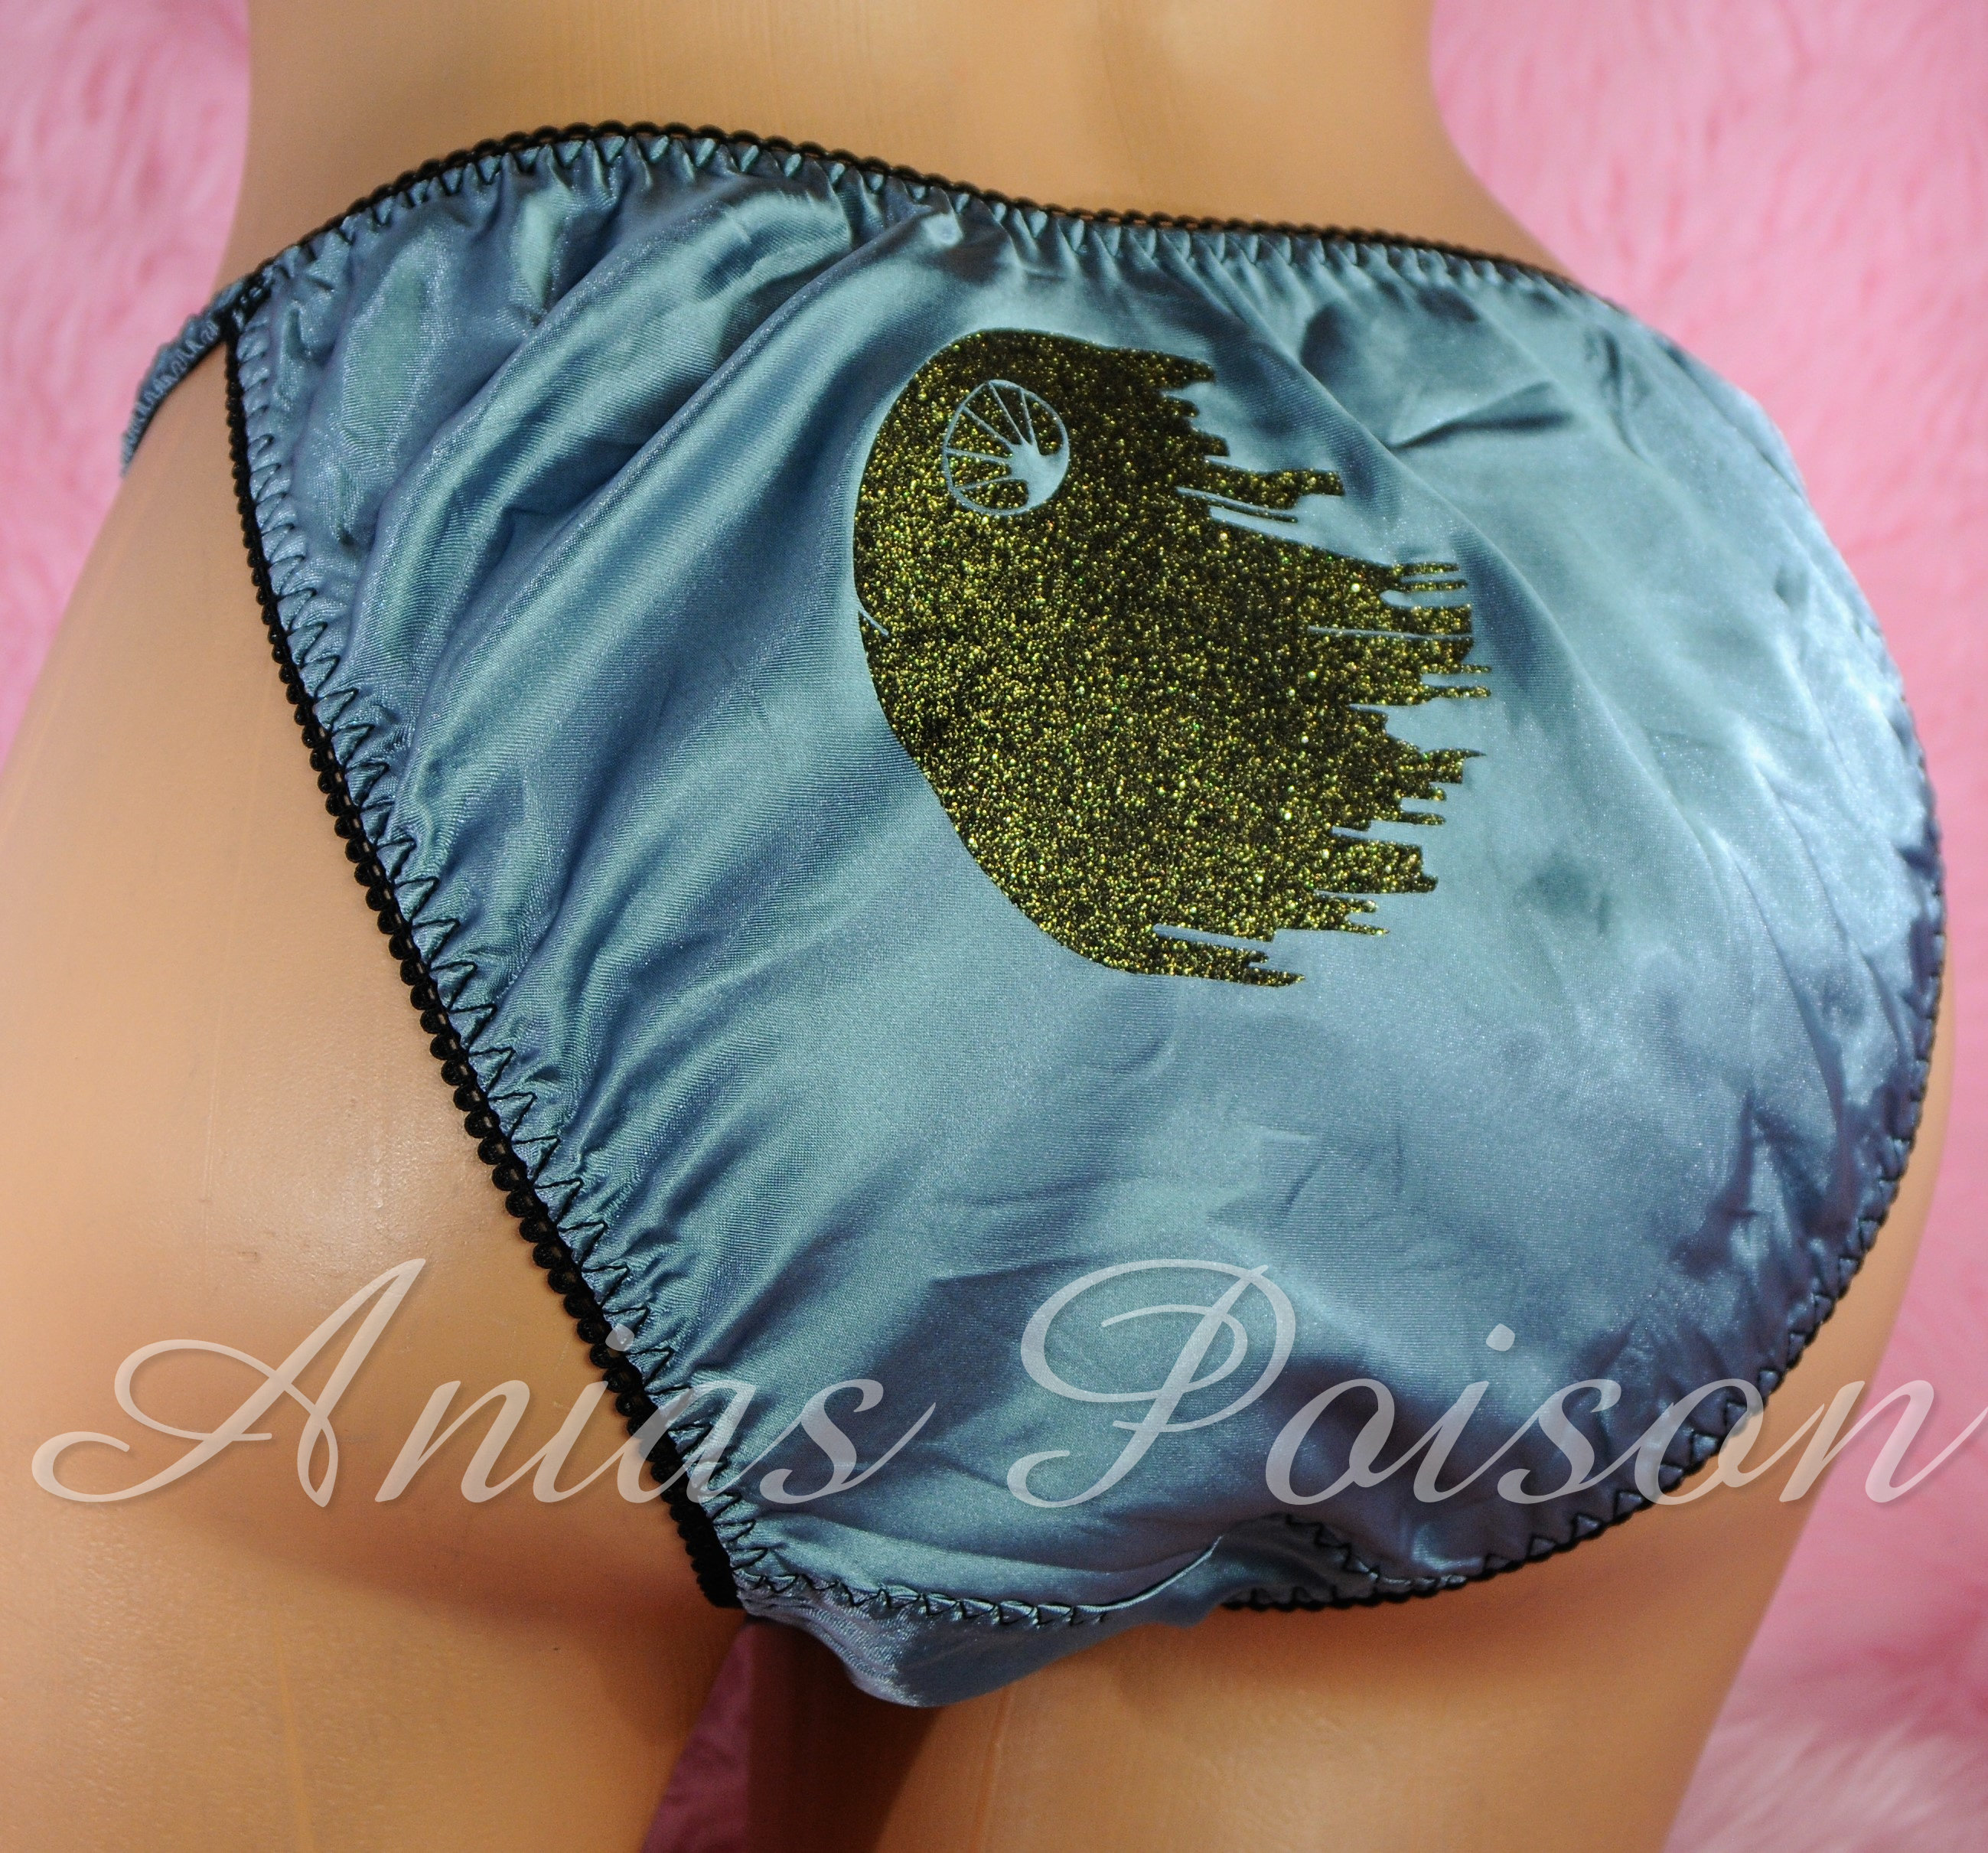 Ania's Poison MANties S - XXL shiny Rare Star OF Death string bikini sissy mens underwear panties